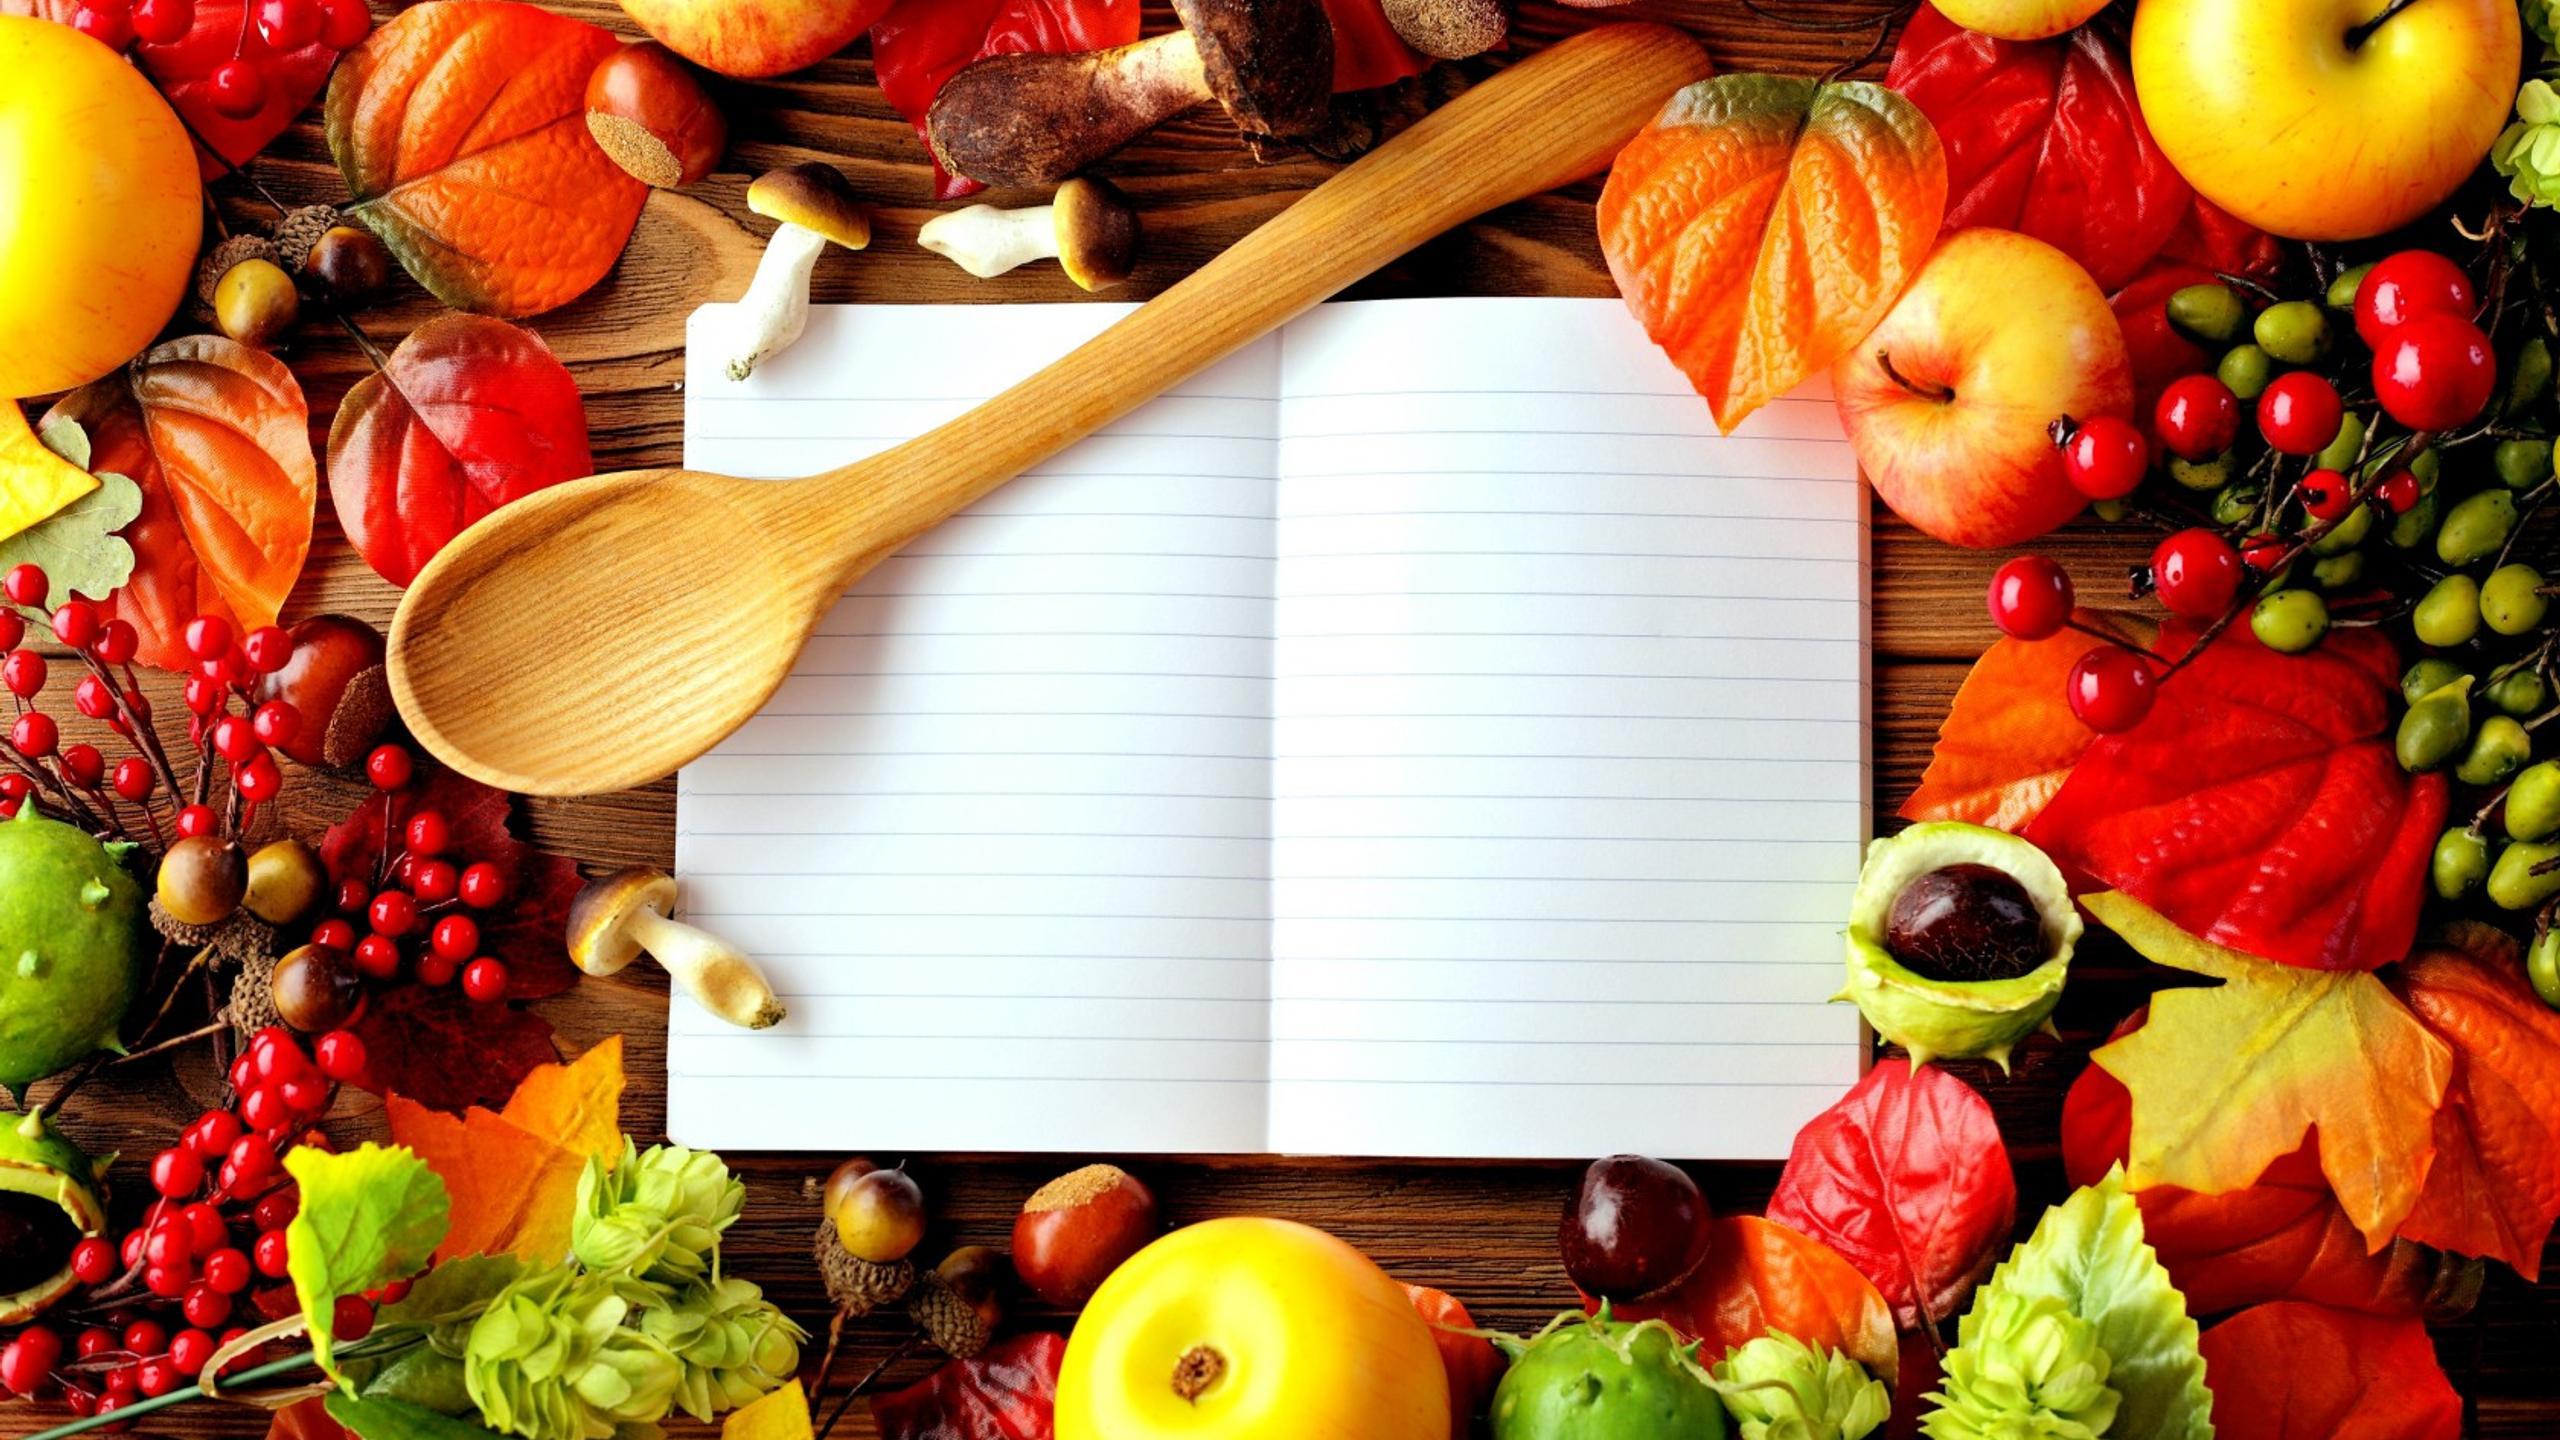 Fall Wallpaper Cute Your Secret Book With Food Recipes Wallpaper Download